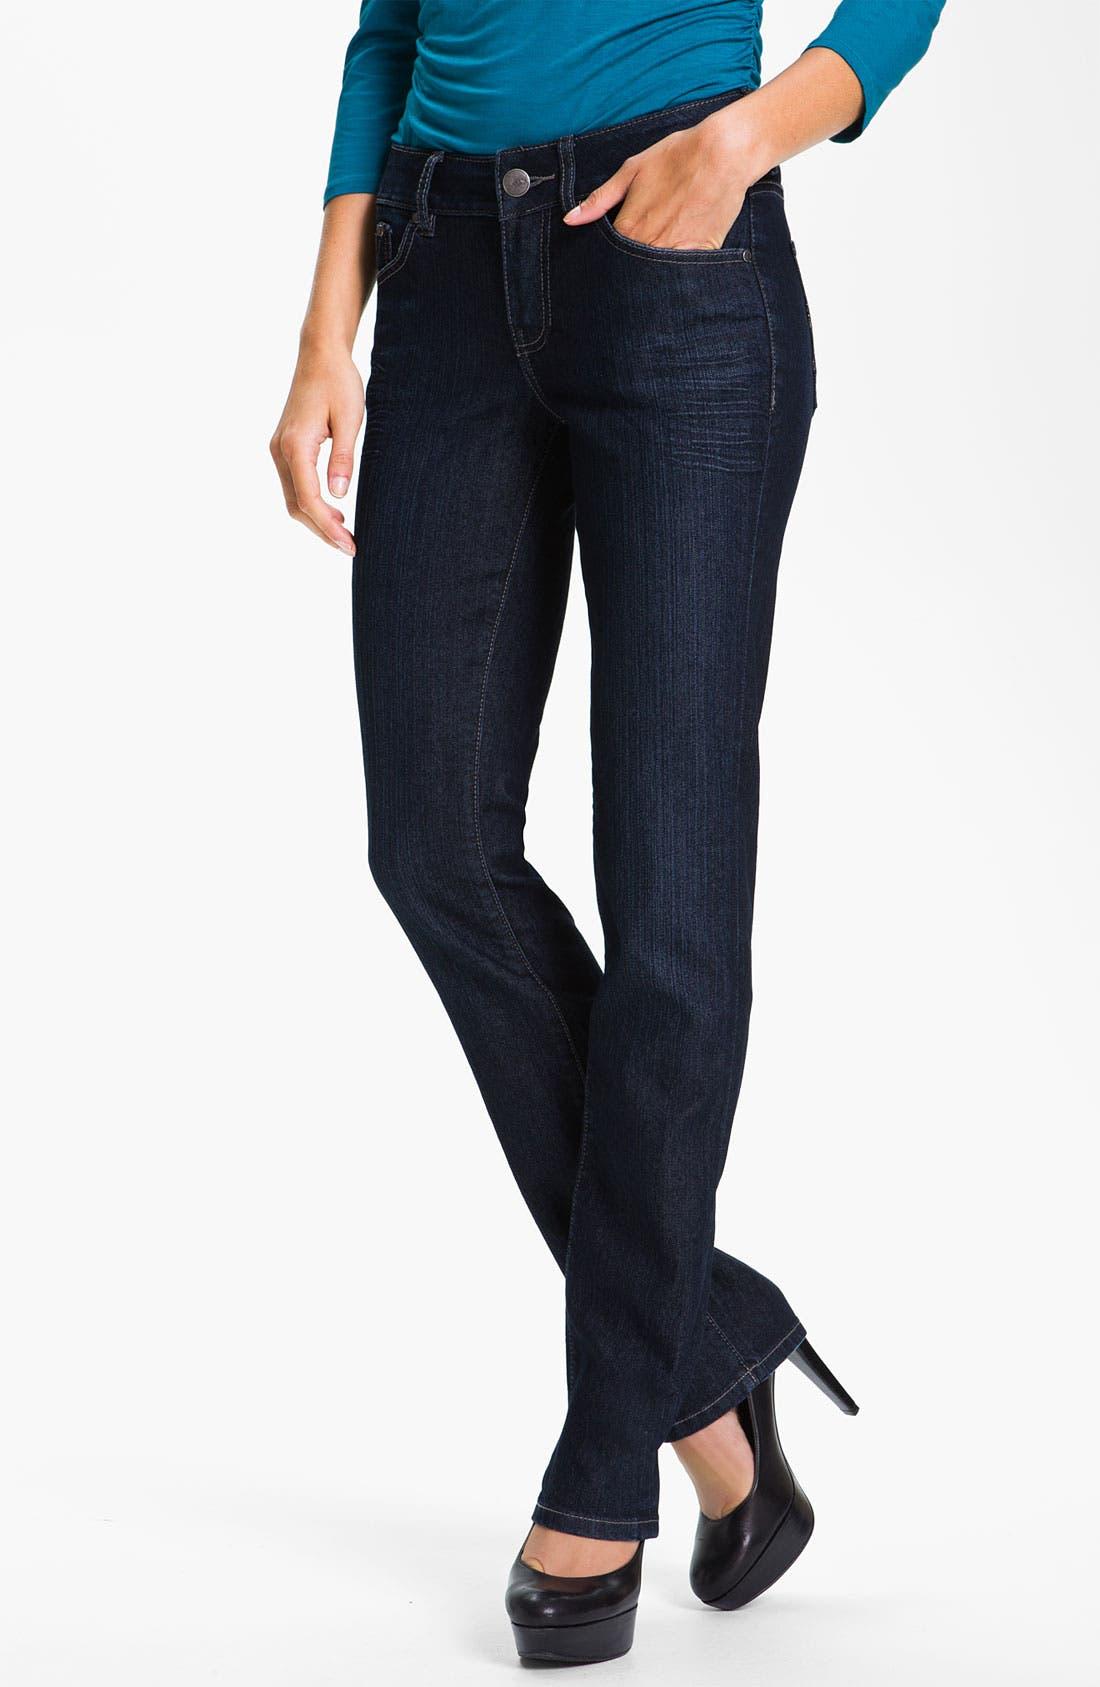 Alternate Image 1 Selected - Jag Jeans 'Eden' Straight Leg Jeans (Indigo) (Petite)